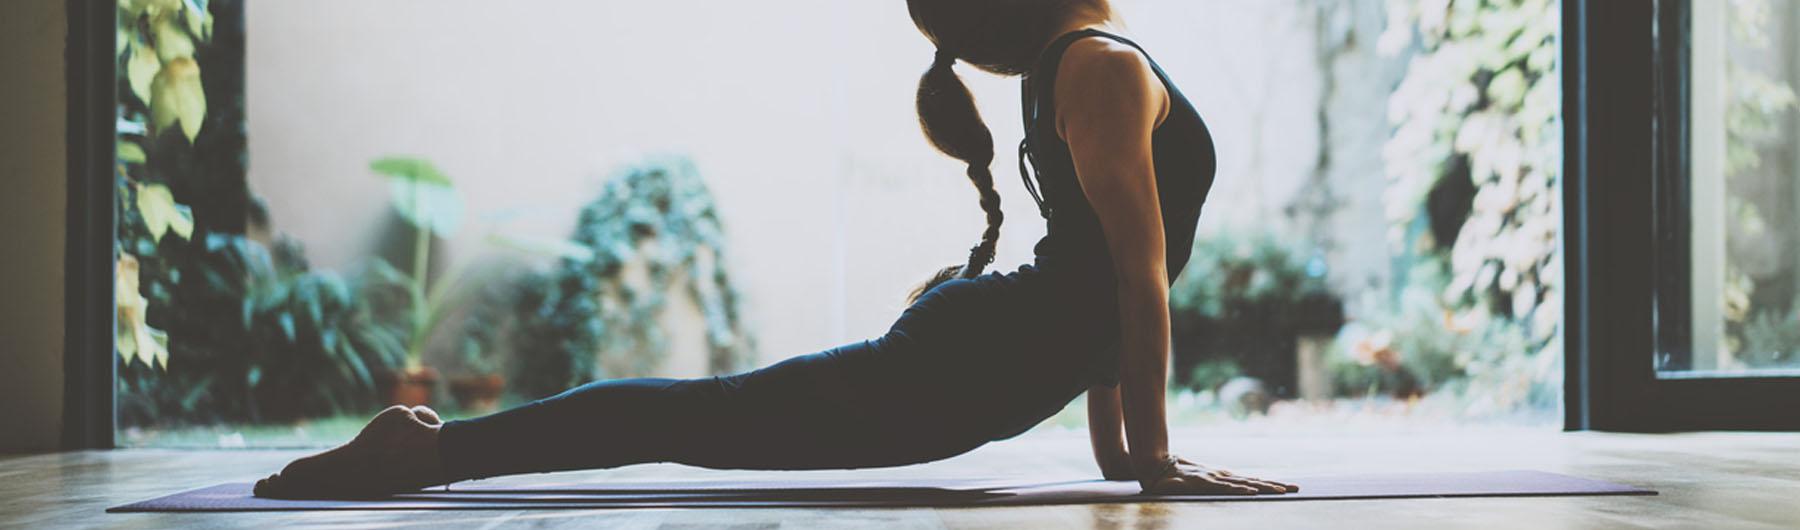 Yoga solidaria